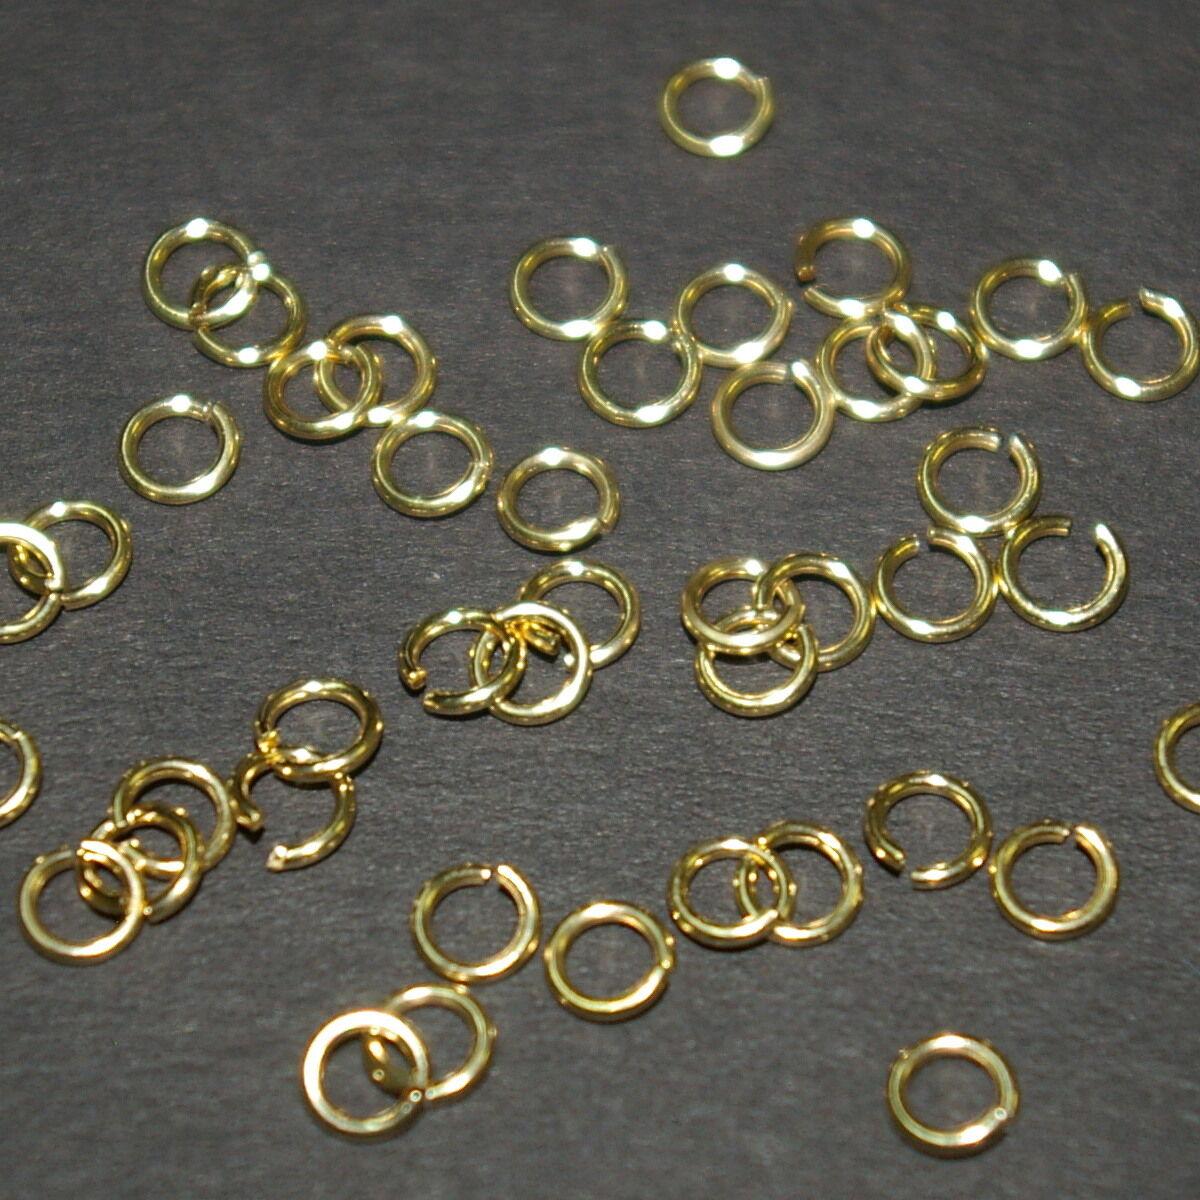 Pkg of 20 // SAW-CUT 22 Ga - O//D 4.0 MM Gold Filled Open Jump Ring